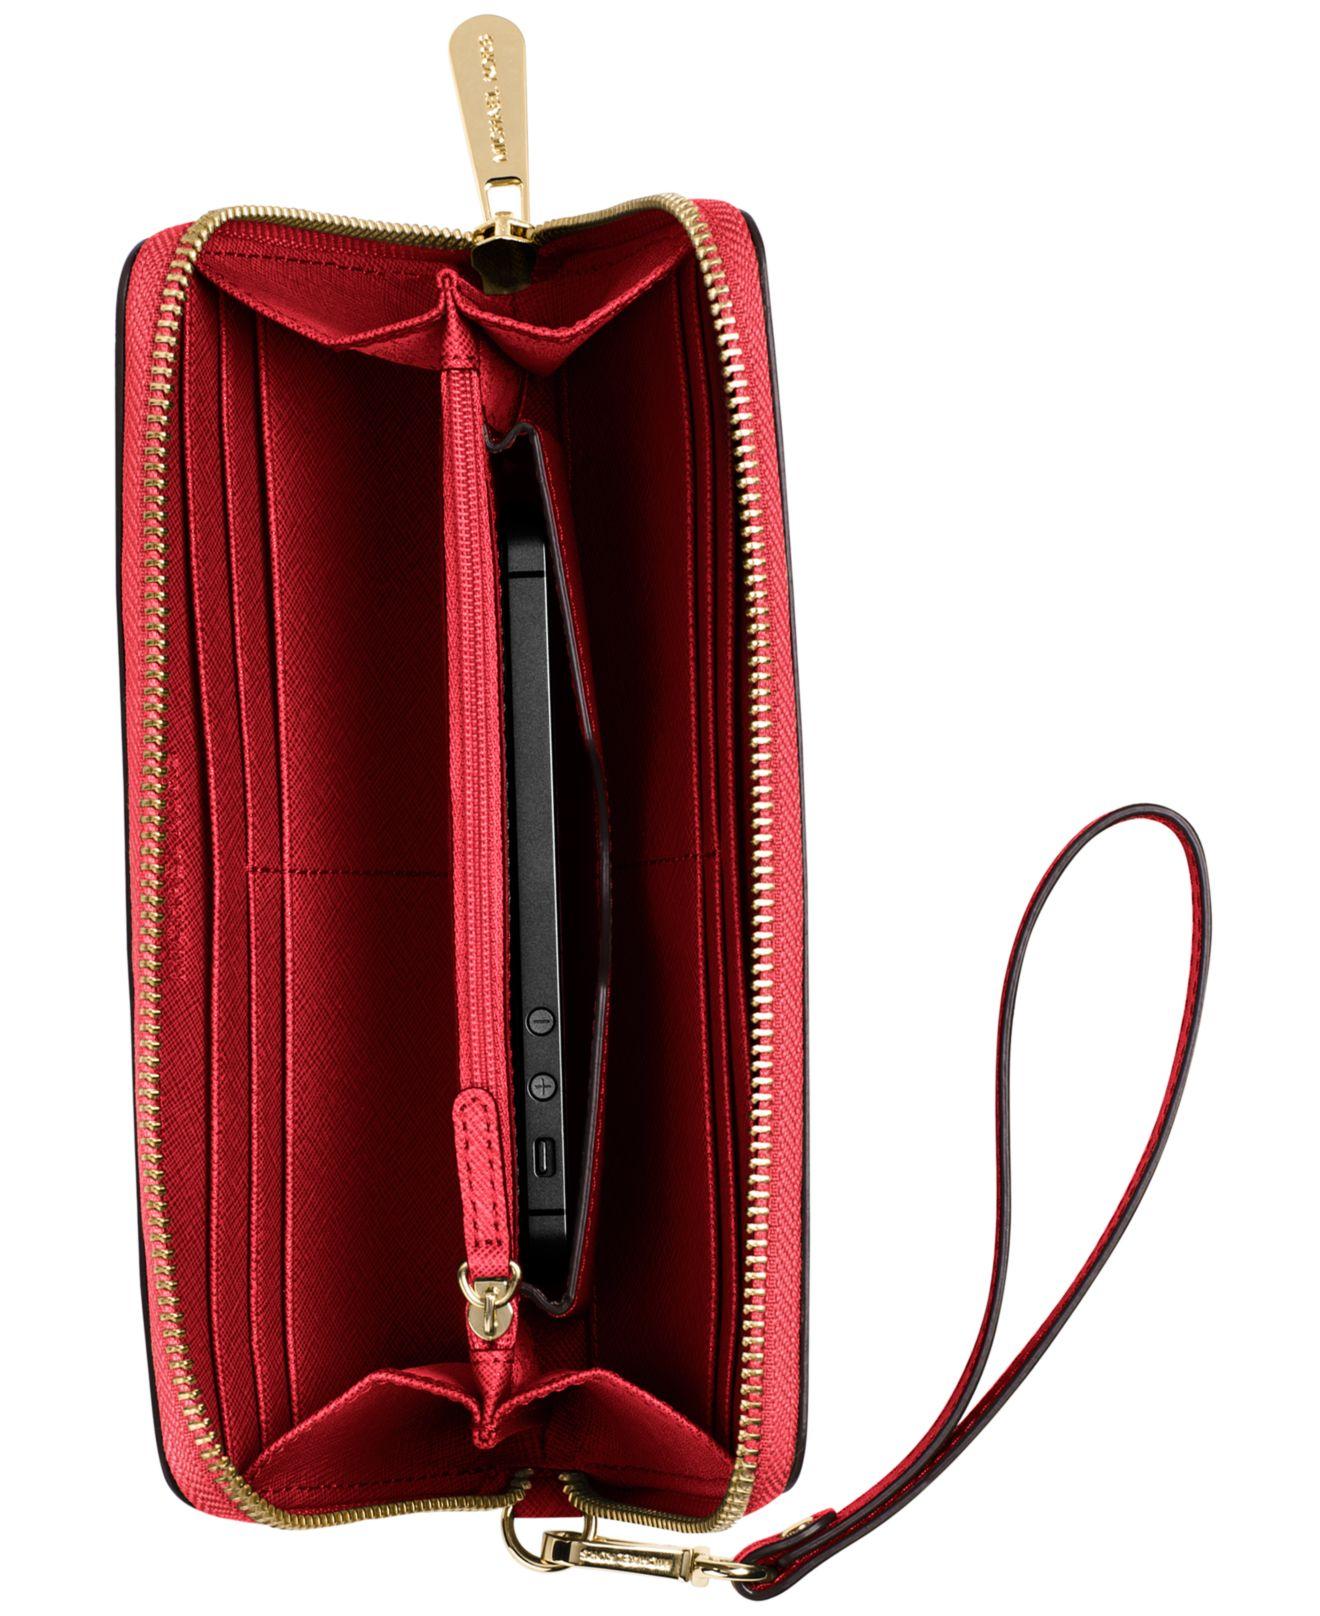 cd8c6d7f1a6d Michael Kors Michael Jet Set Travel Tech Continental Wallet in Red ...